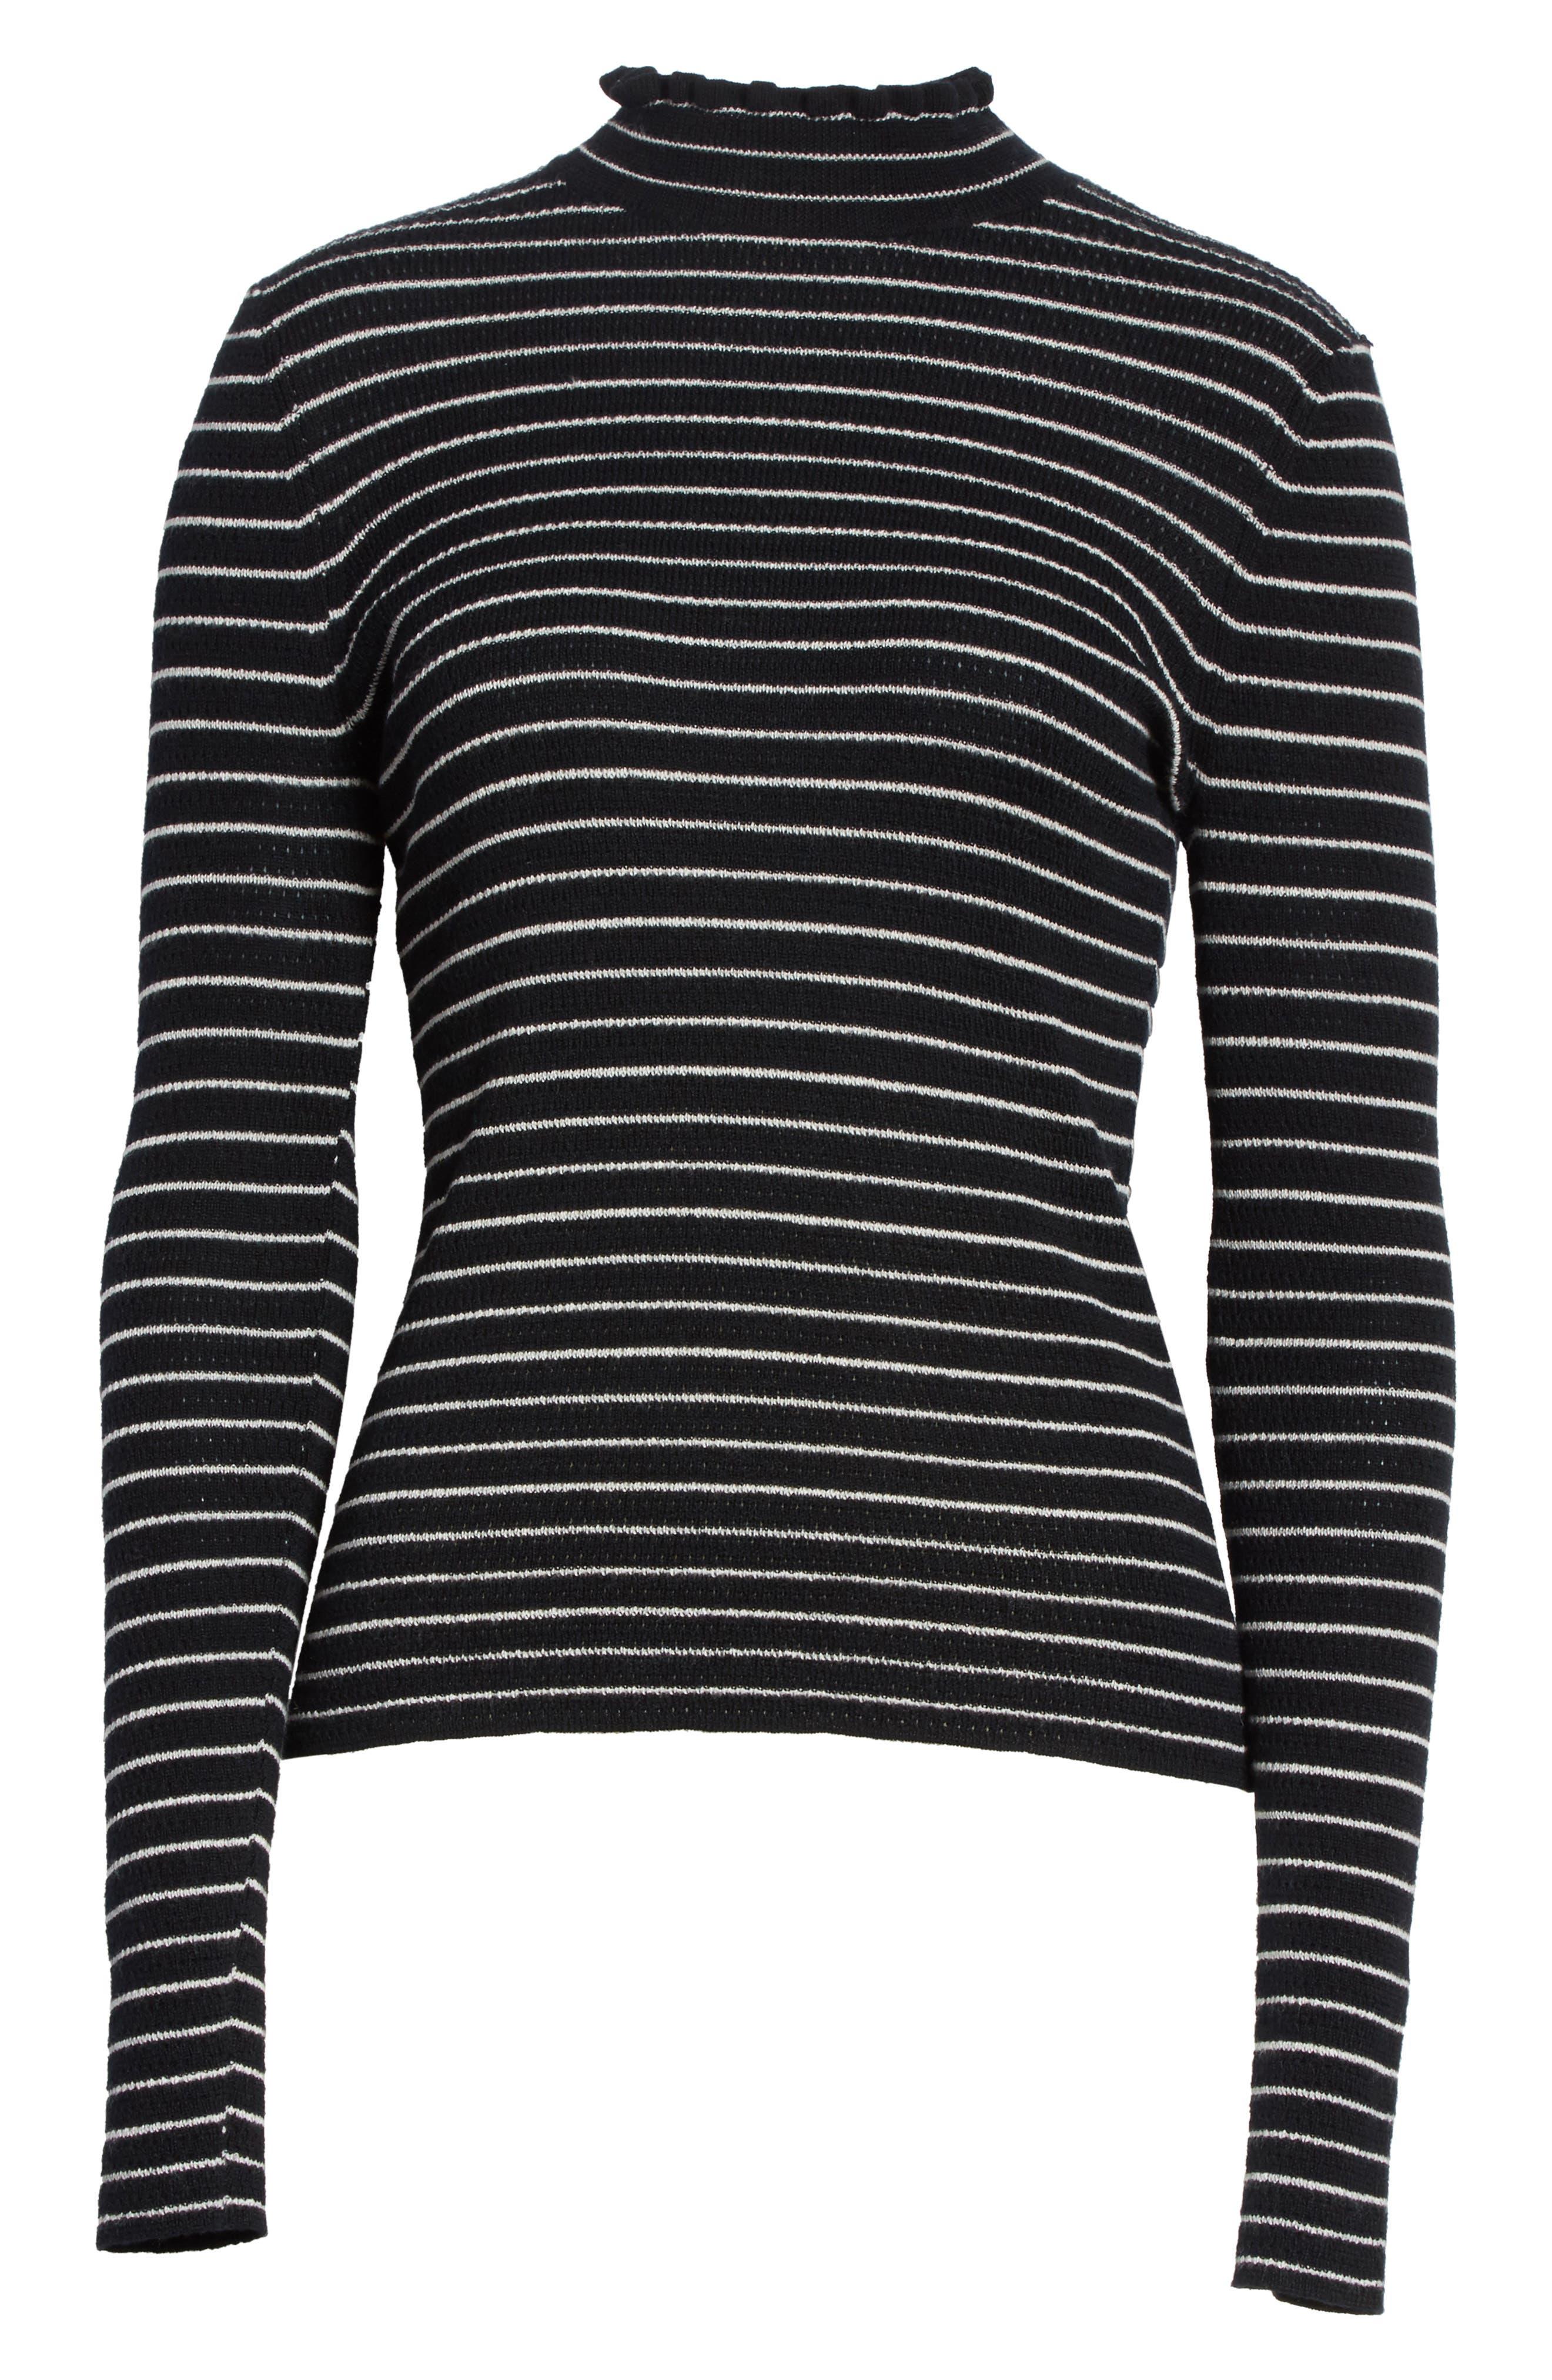 Merino Wool Pullover,                             Alternate thumbnail 6, color,                             Black Stripe